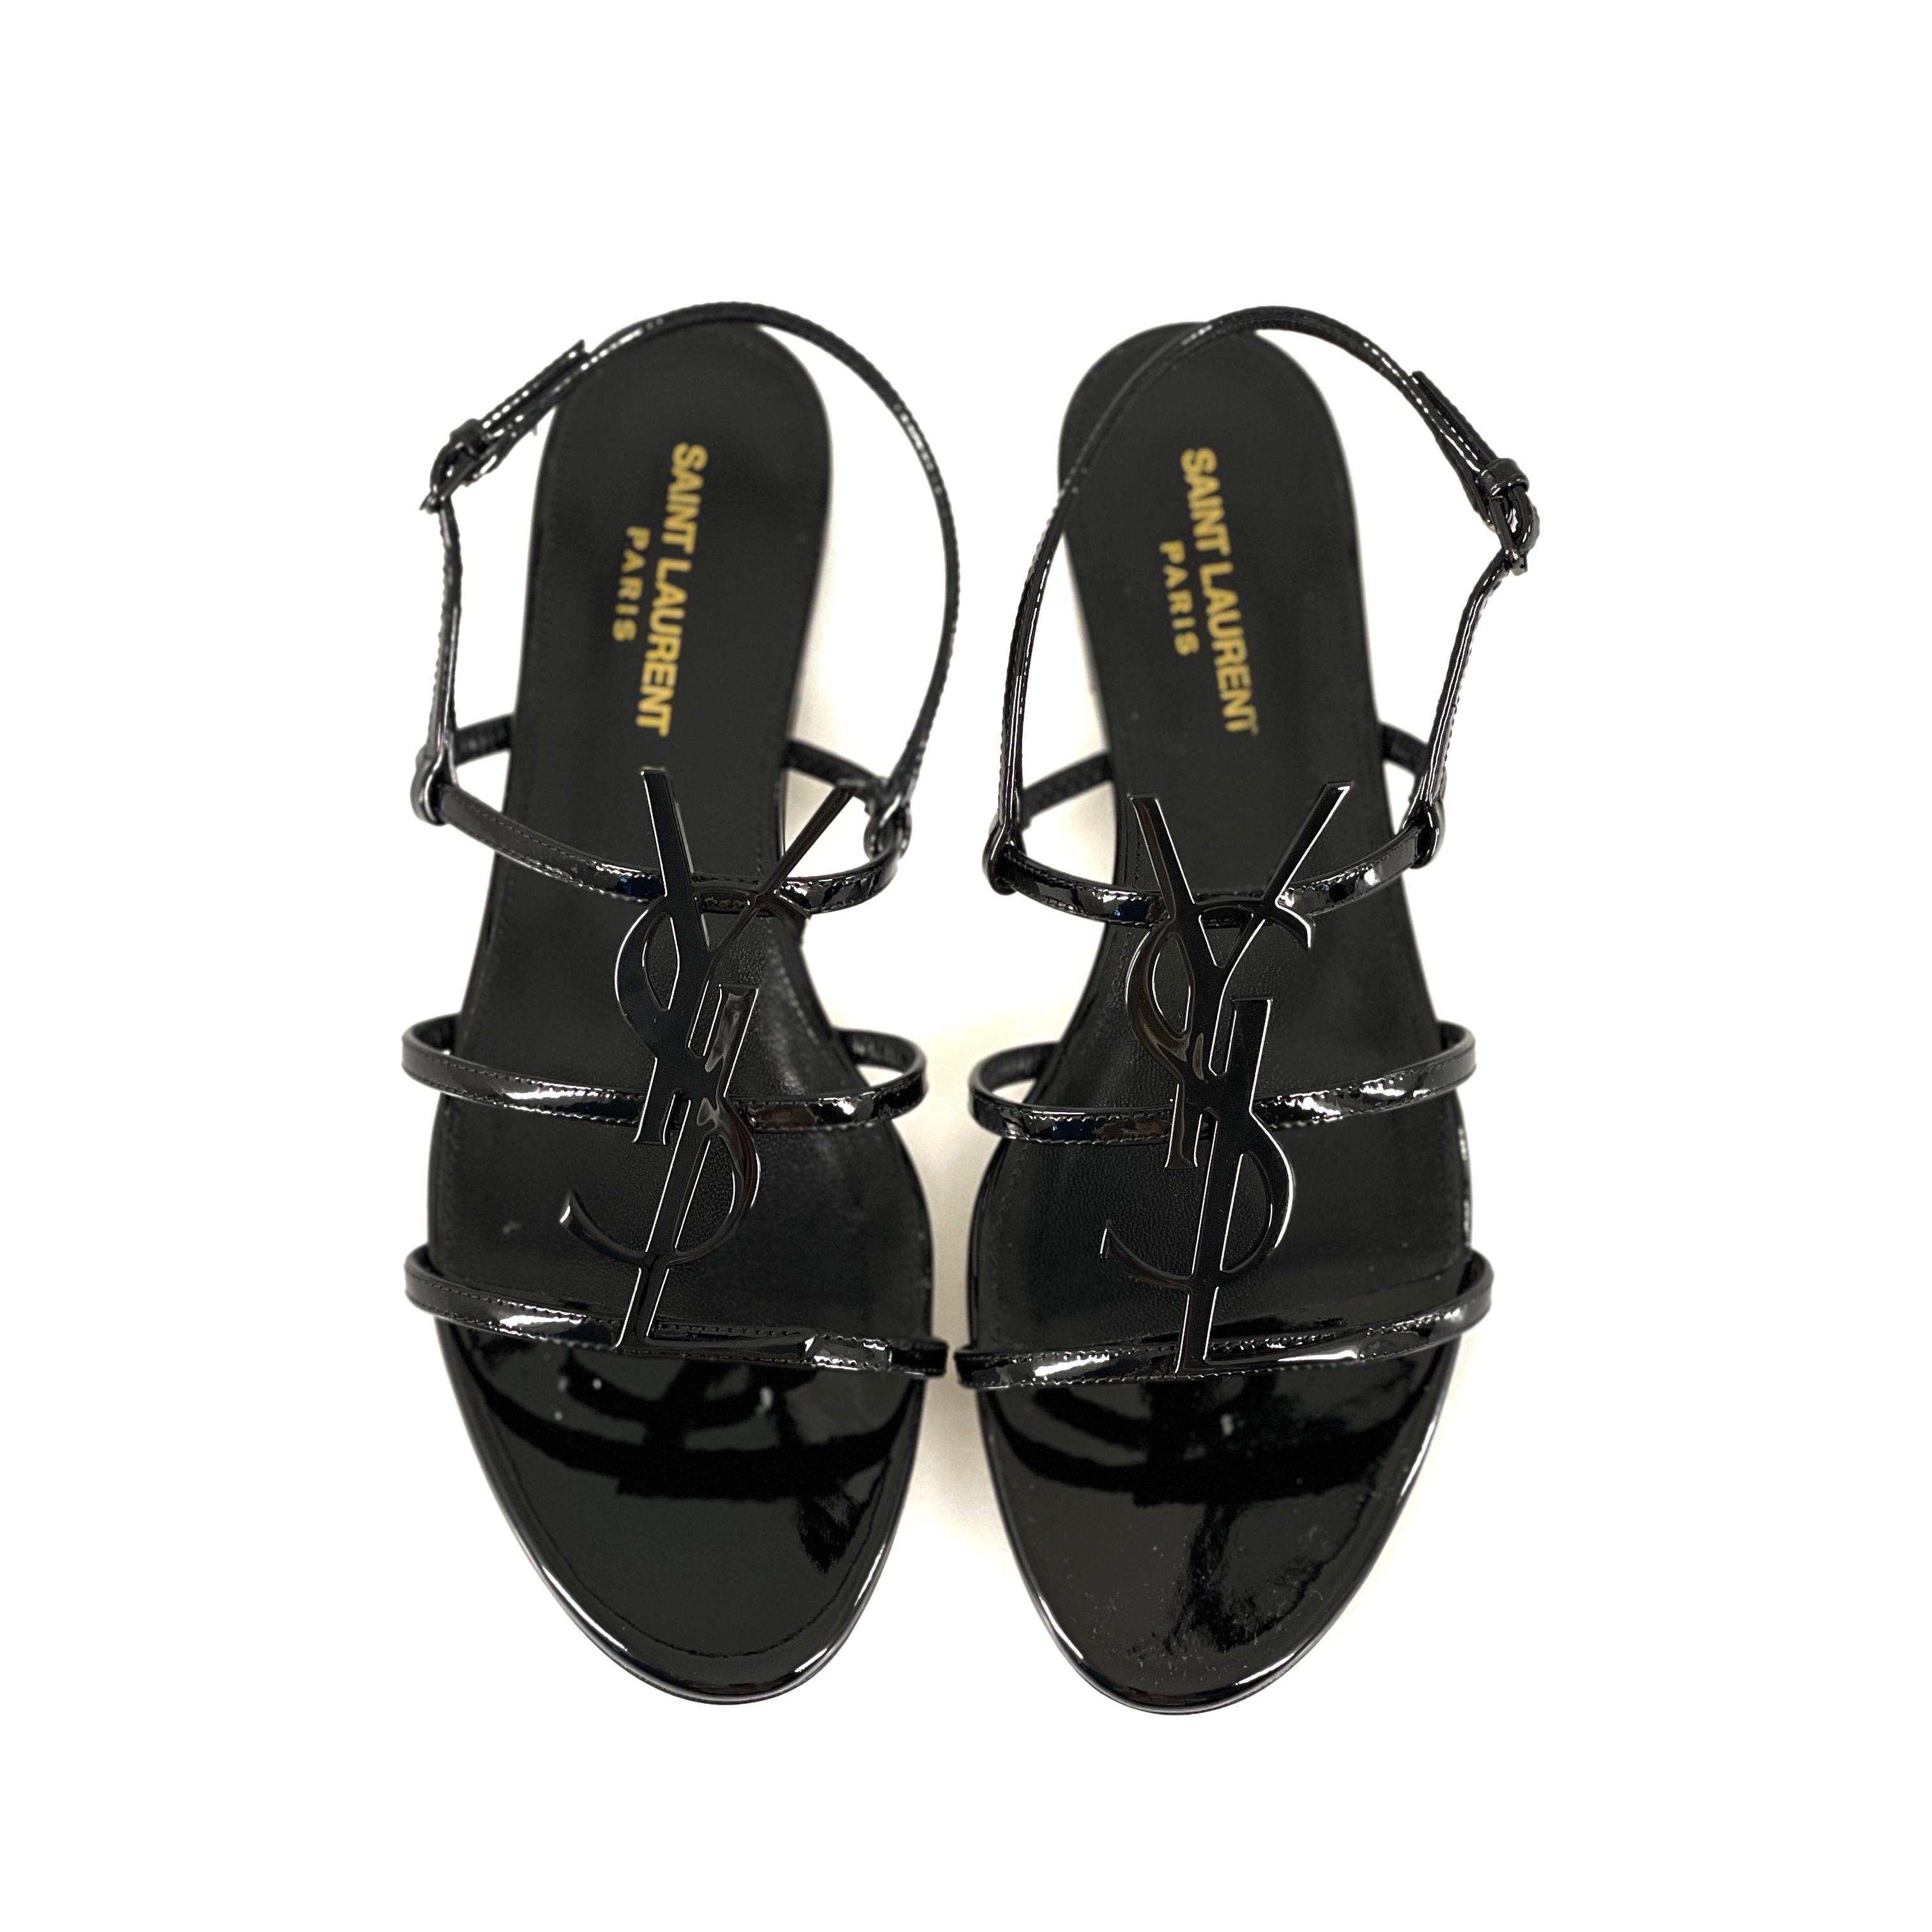 Saint Laurent sandal 38 SV6563